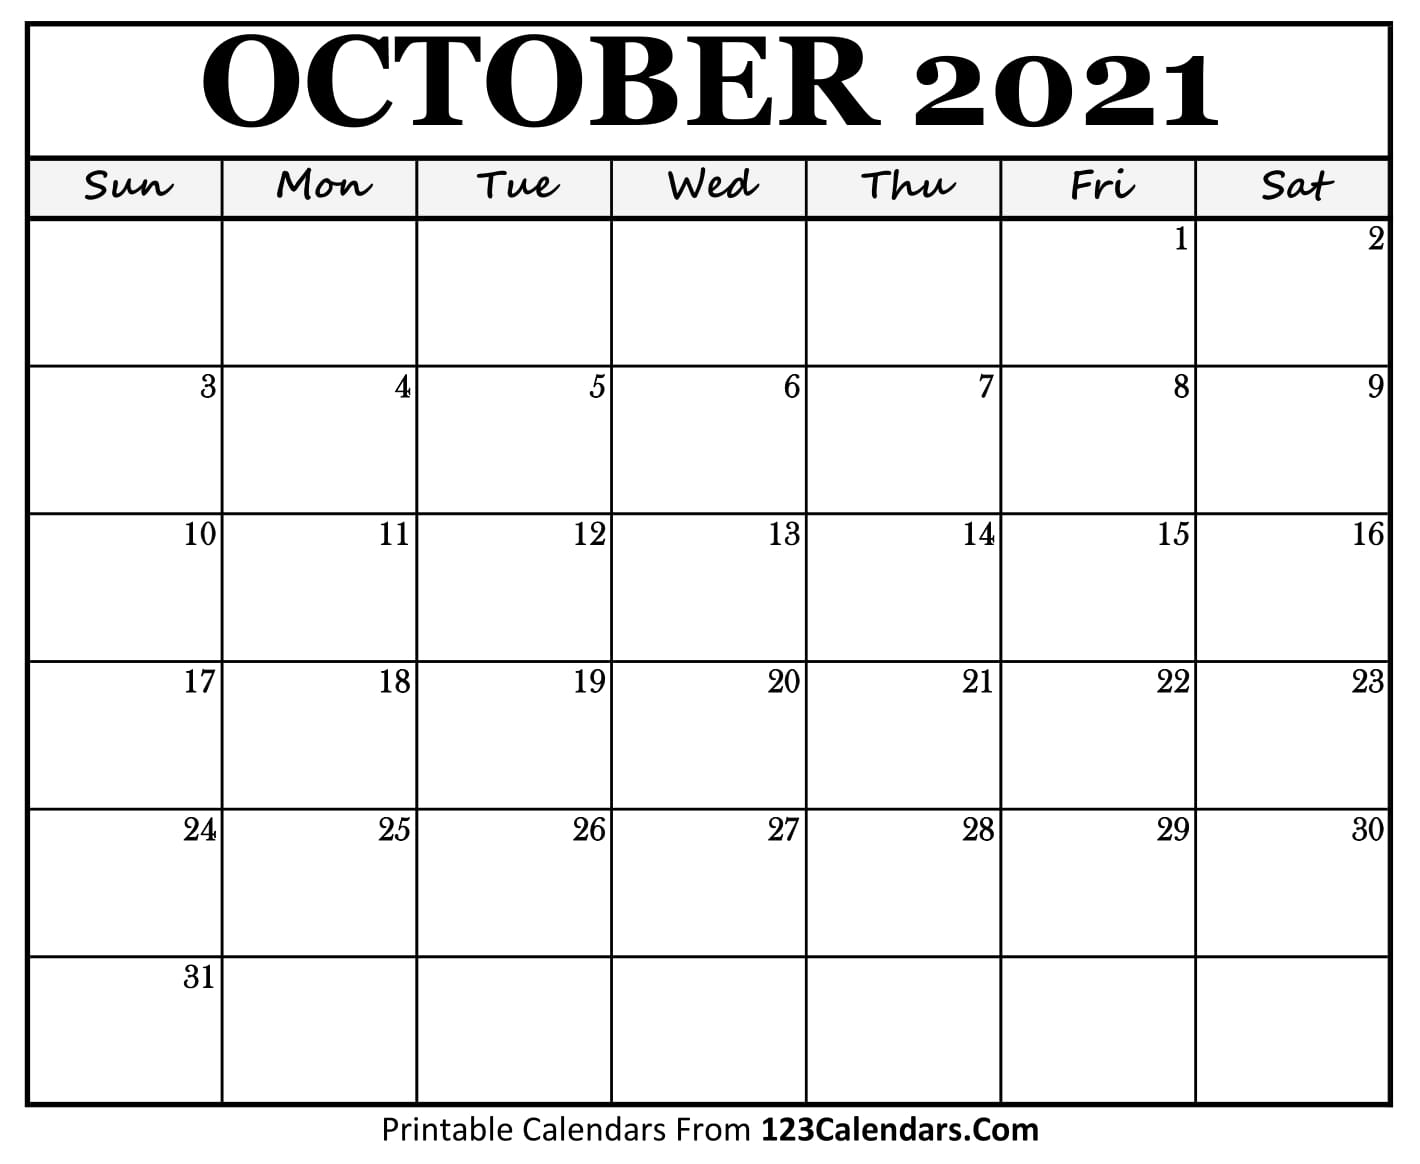 Printable October 2021 Calendar Templates   123Calendars